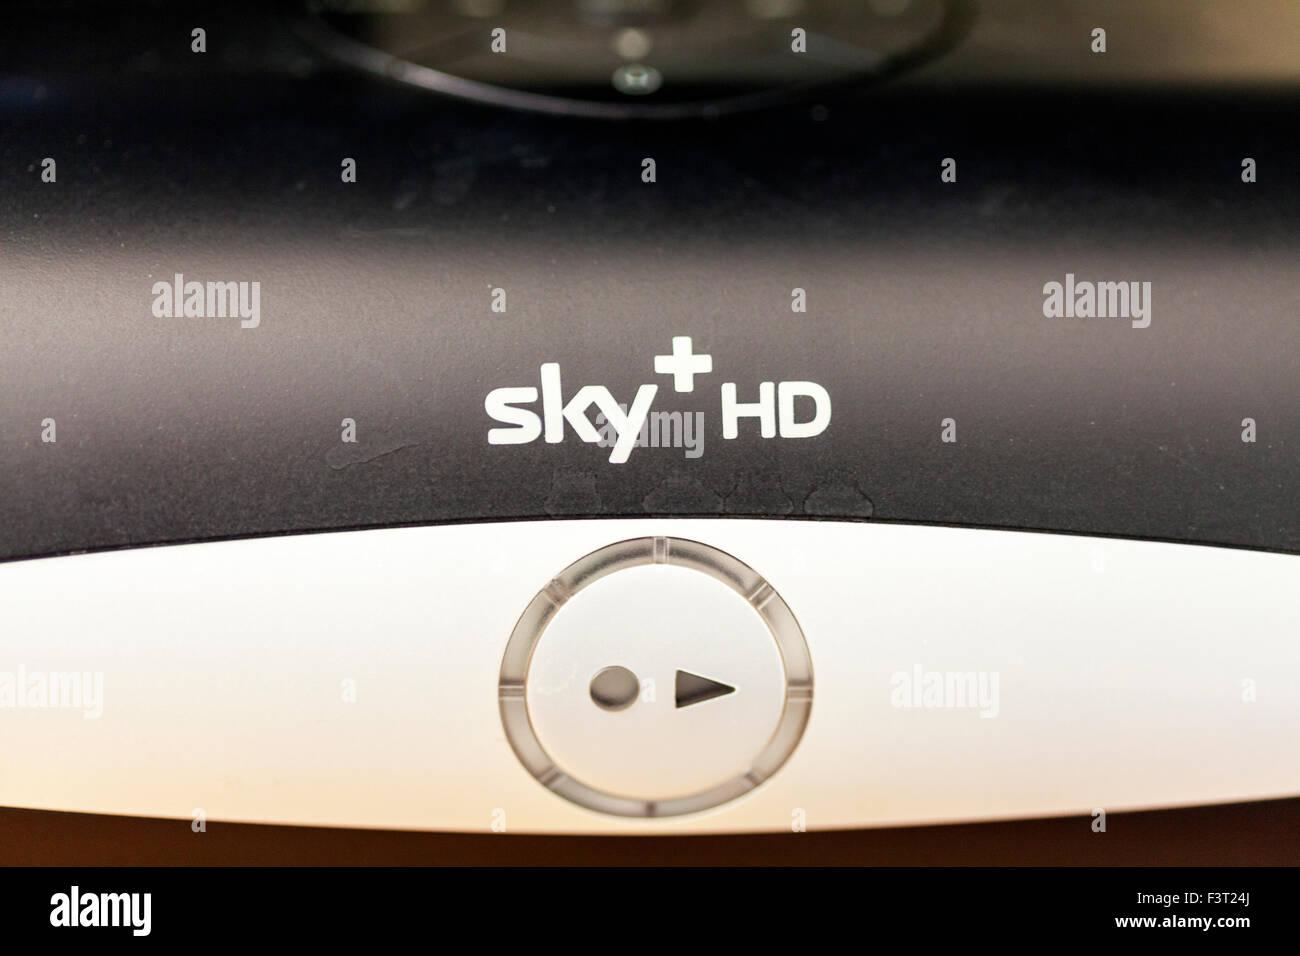 Sky HD box TV television satellite streaming box sky+ bskyb logo name - Stock Image